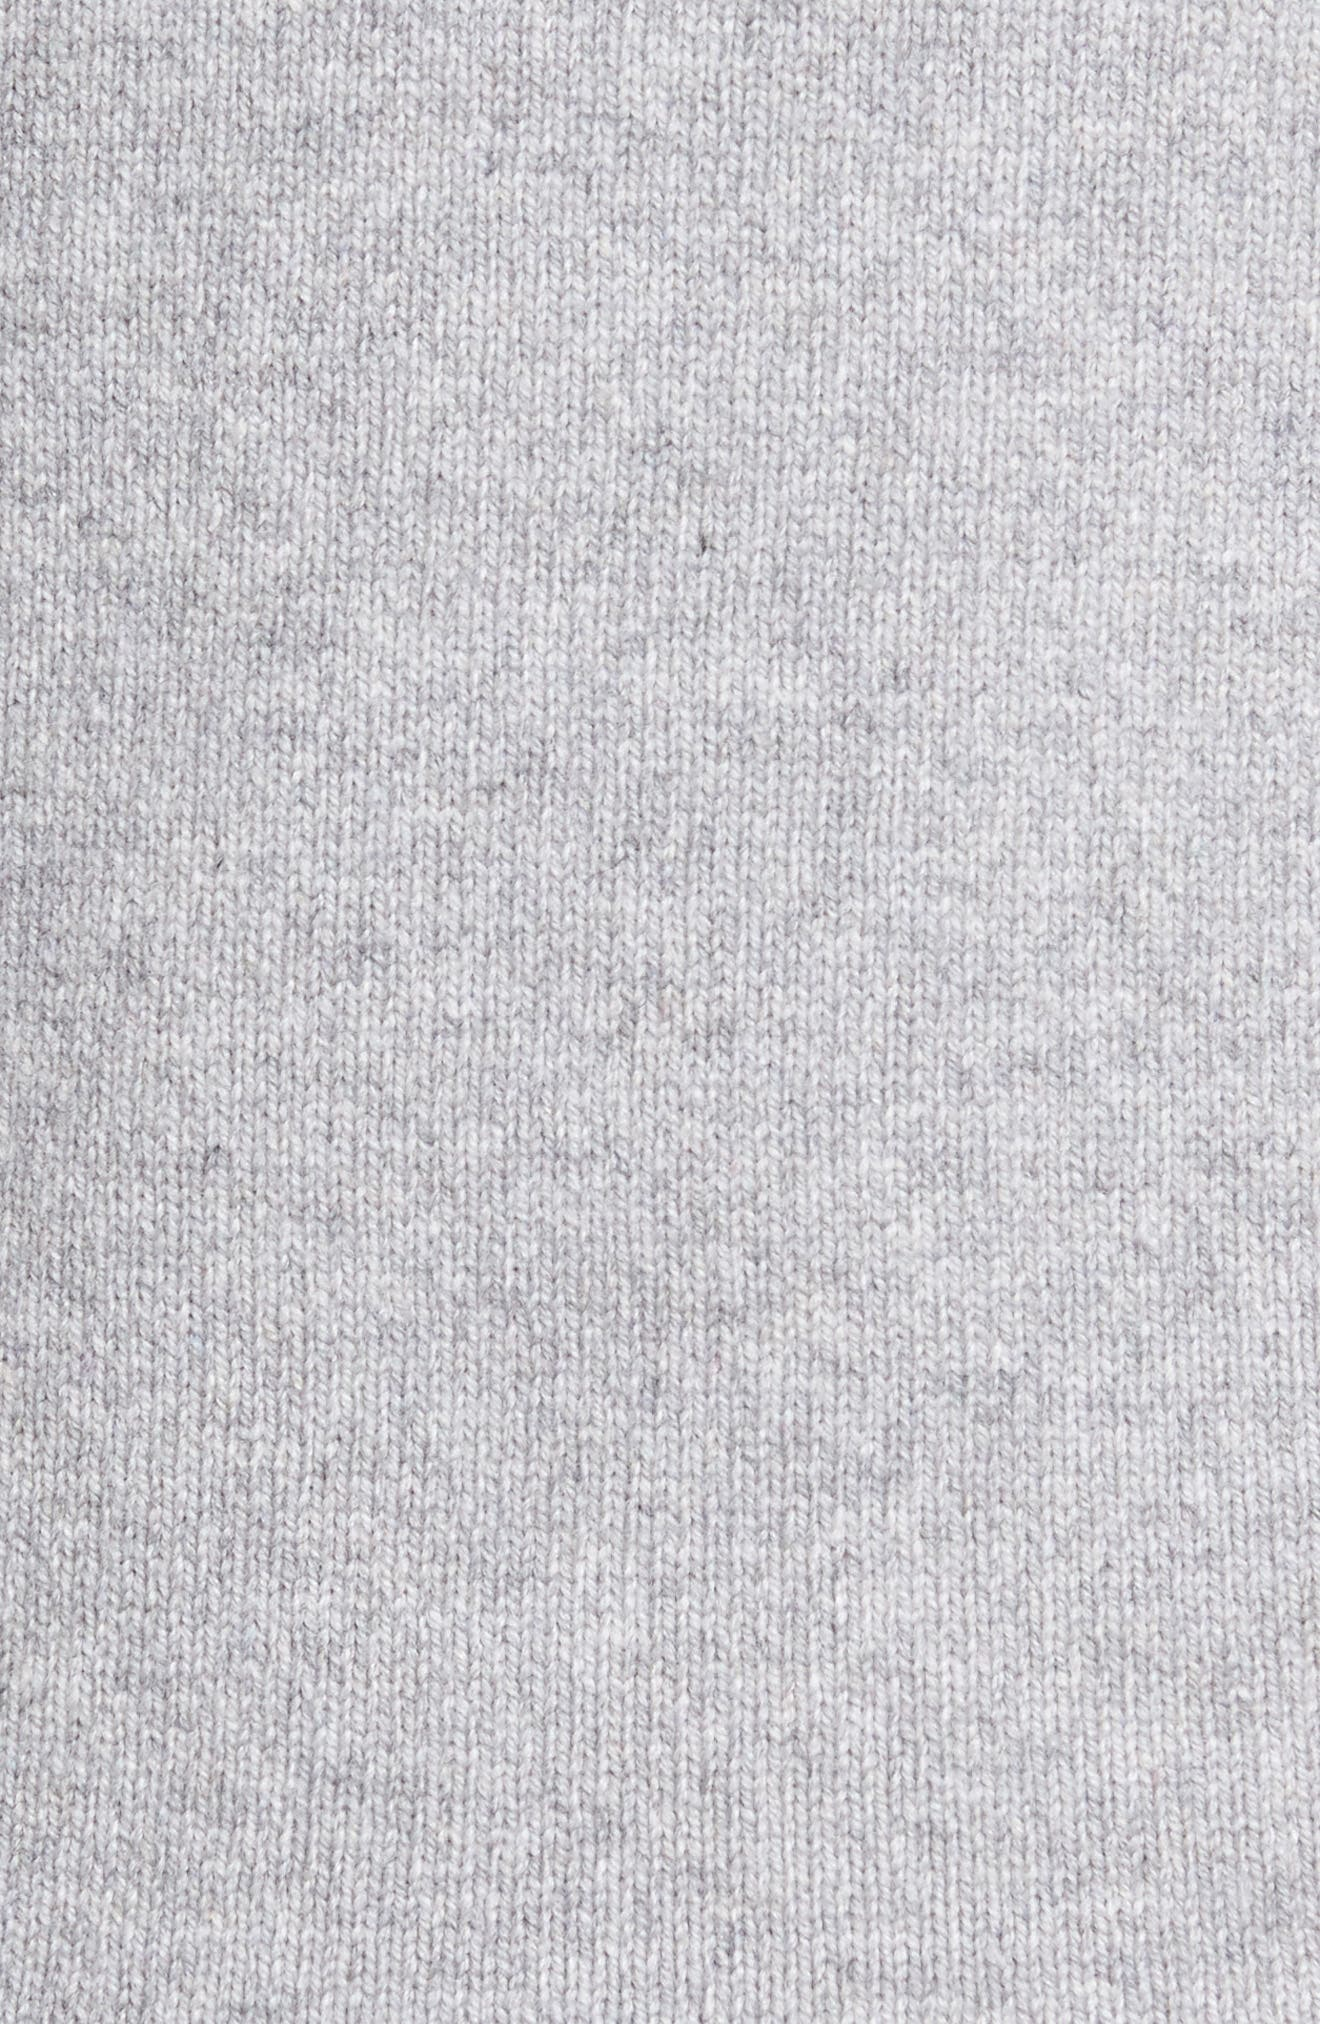 Slim Fit Merino Wool & Cashmere Cardigan,                             Alternate thumbnail 5, color,                             Silver